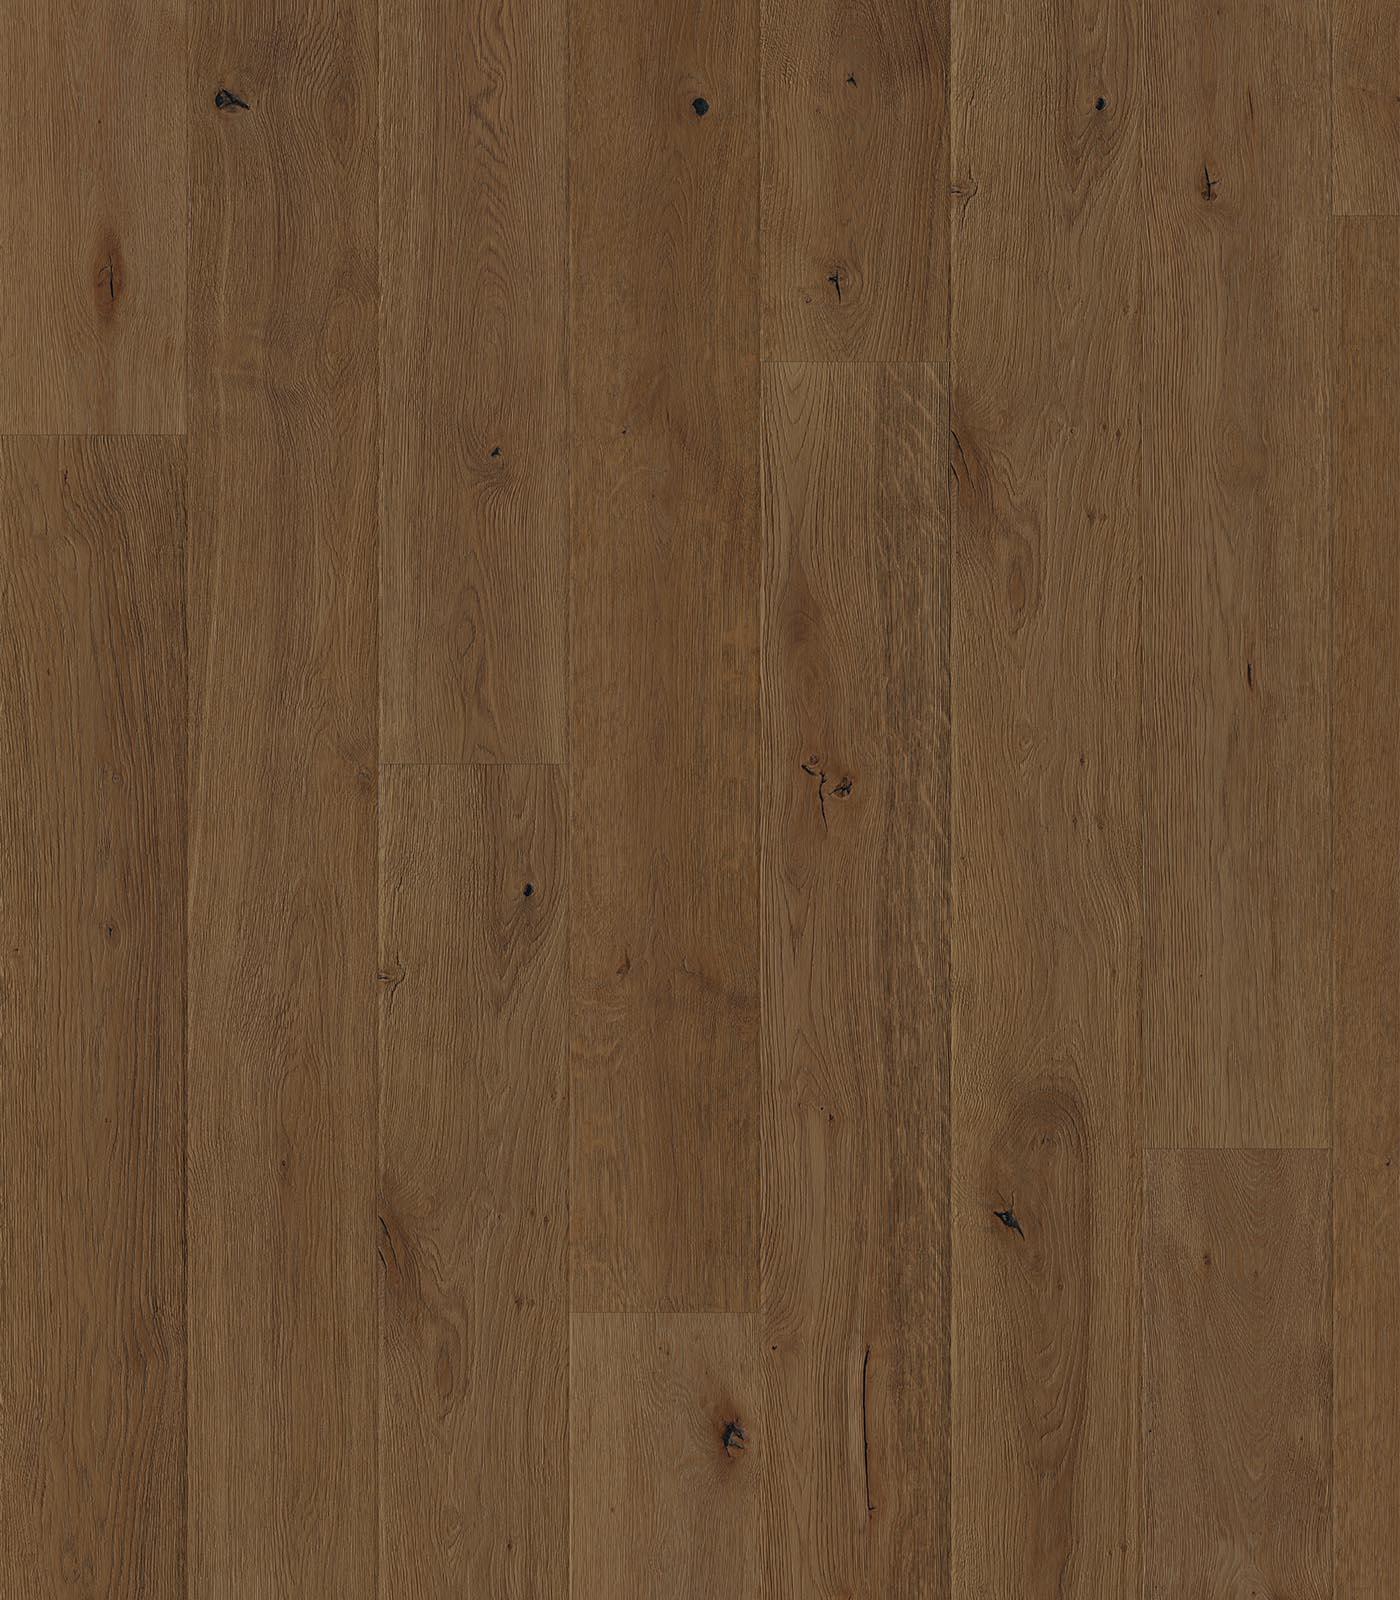 Oporto-Heritage Collection-European oak flooring-flat